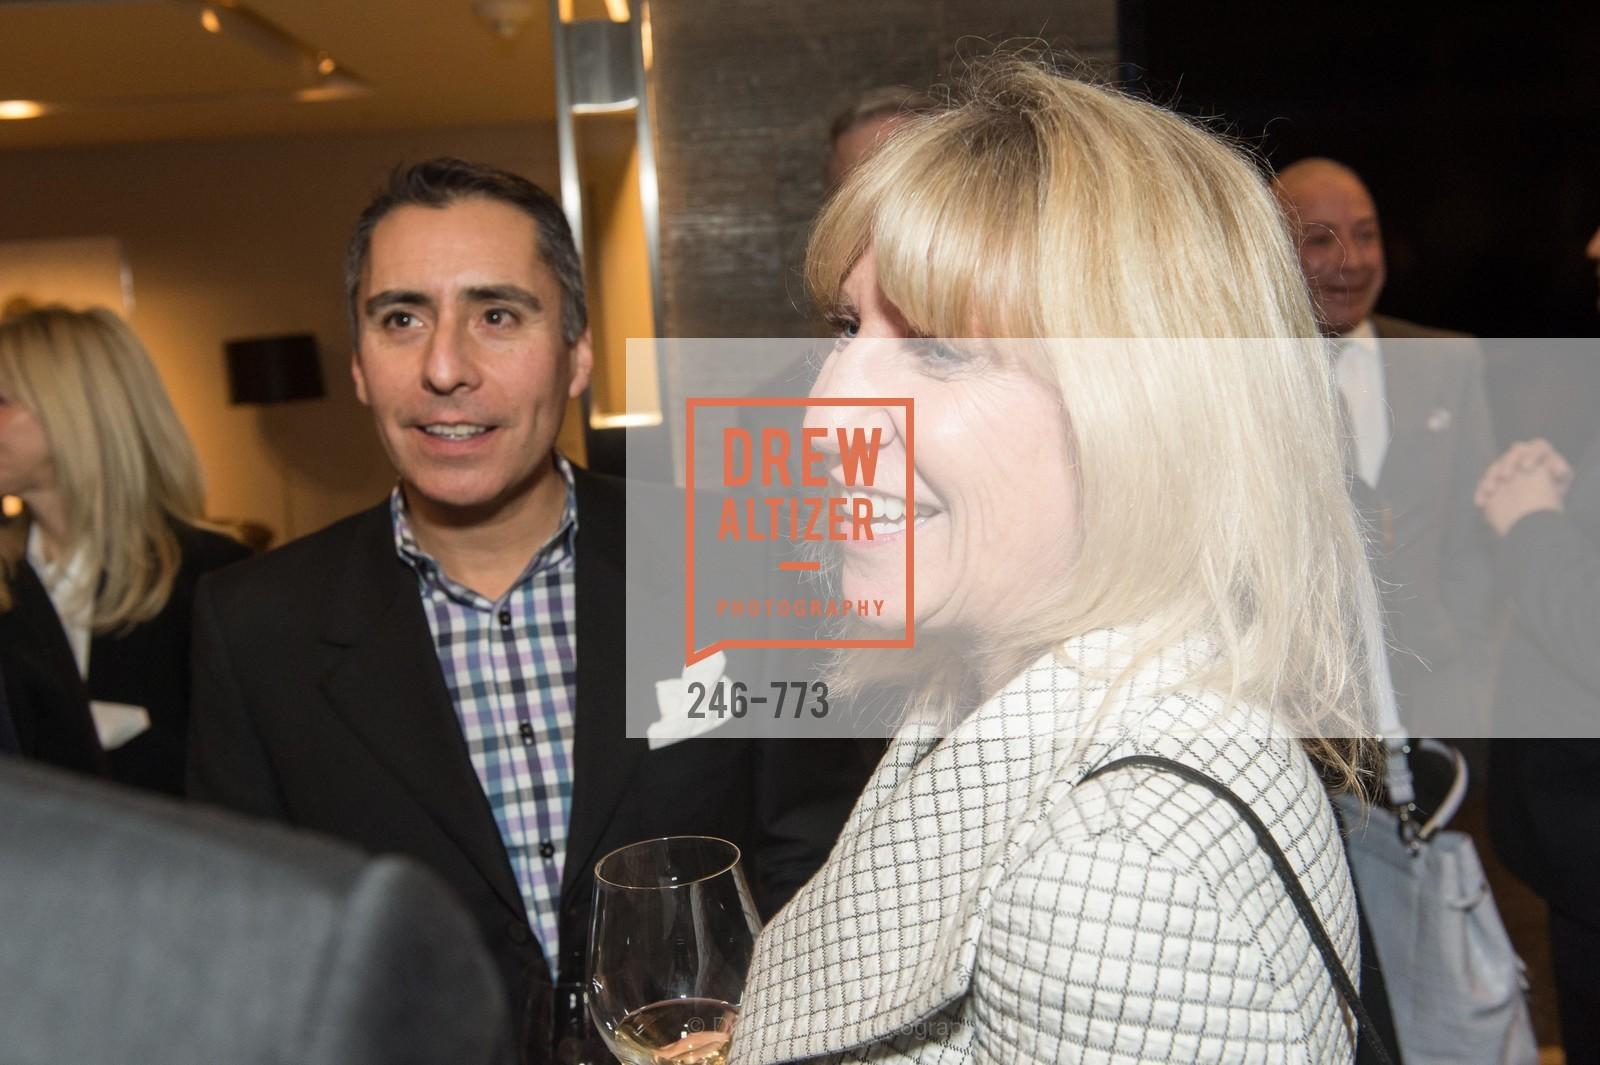 Paul Ybarbo, Kathy Korte, Photo #246-773